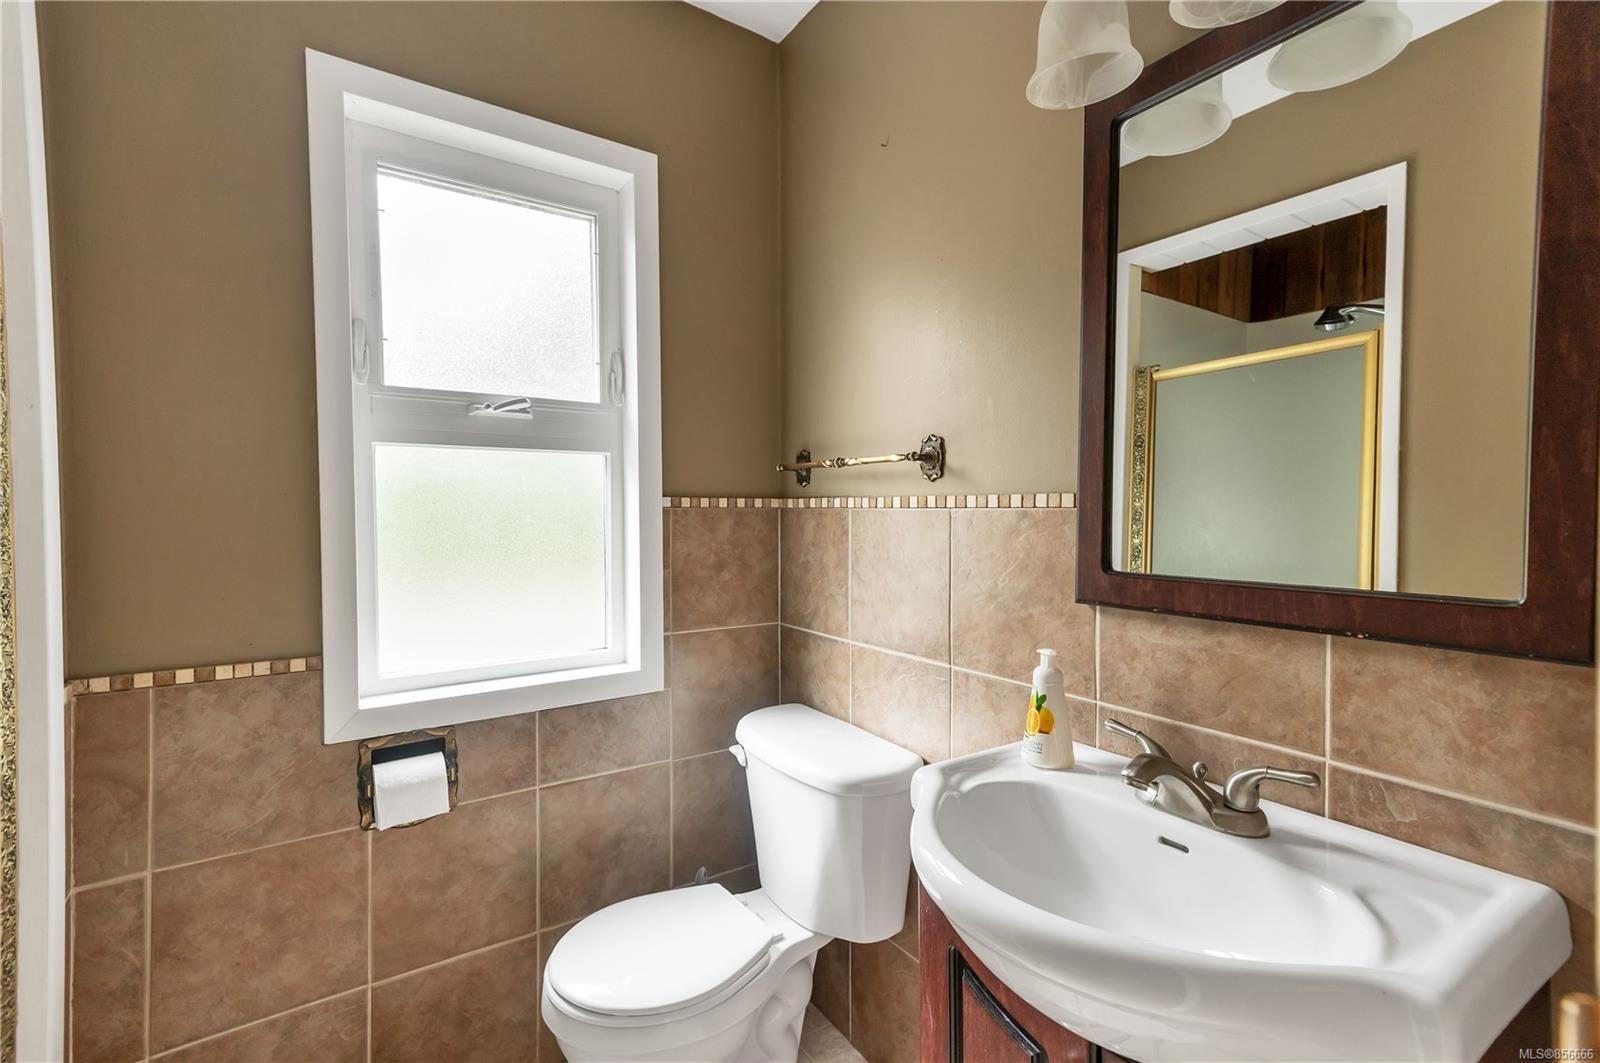 Photo 27: Photos: 2468 Oakes Rd in : CV Merville Black Creek House for sale (Comox Valley)  : MLS®# 856666